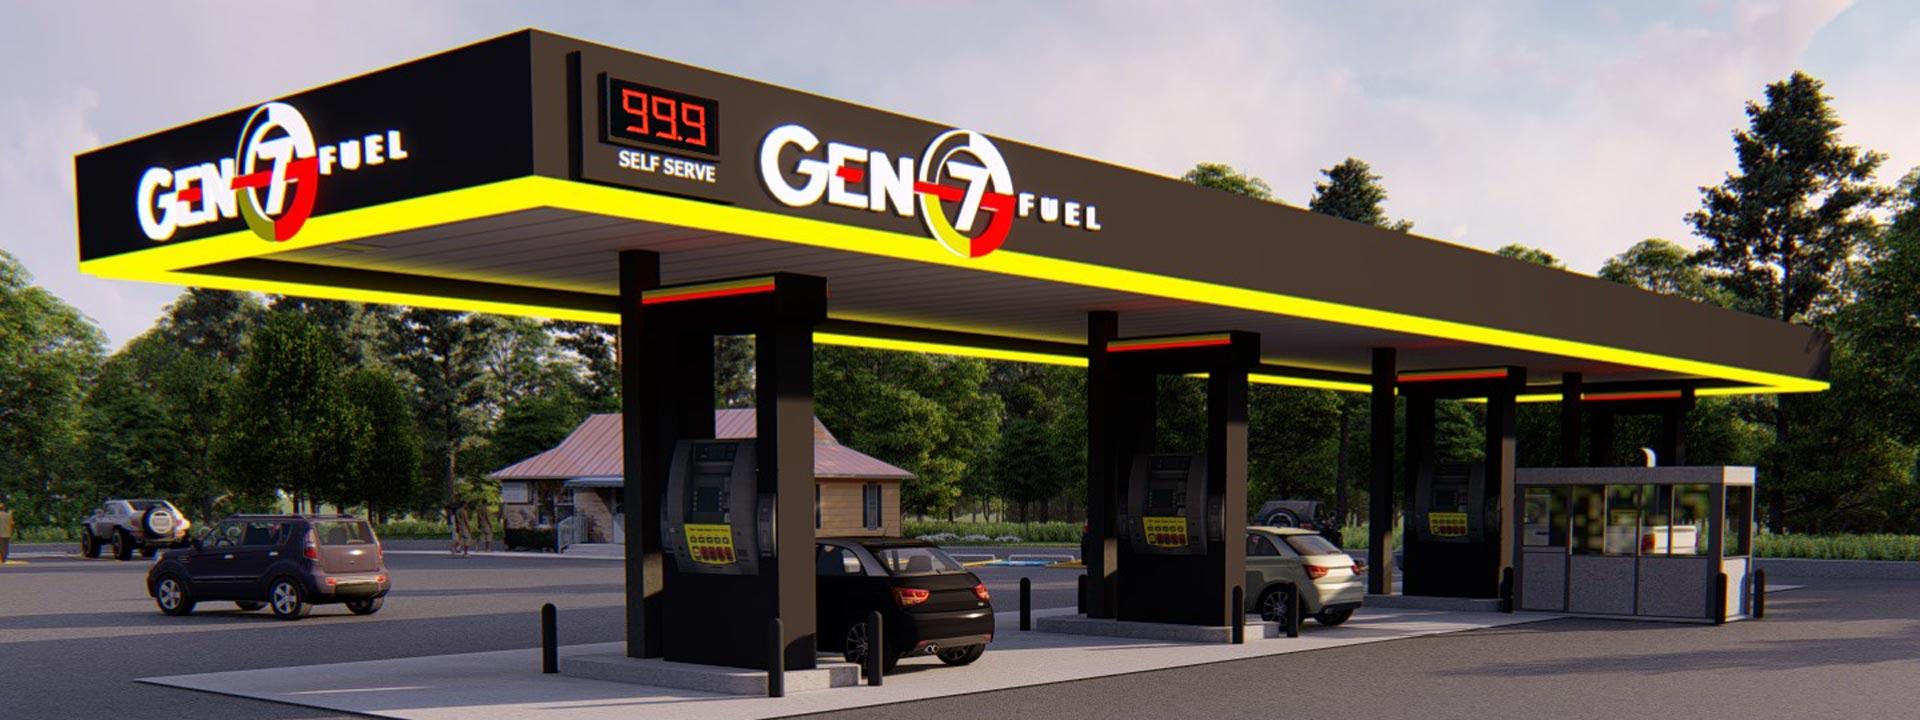 Gen7 Fuel Oneida Gas Station